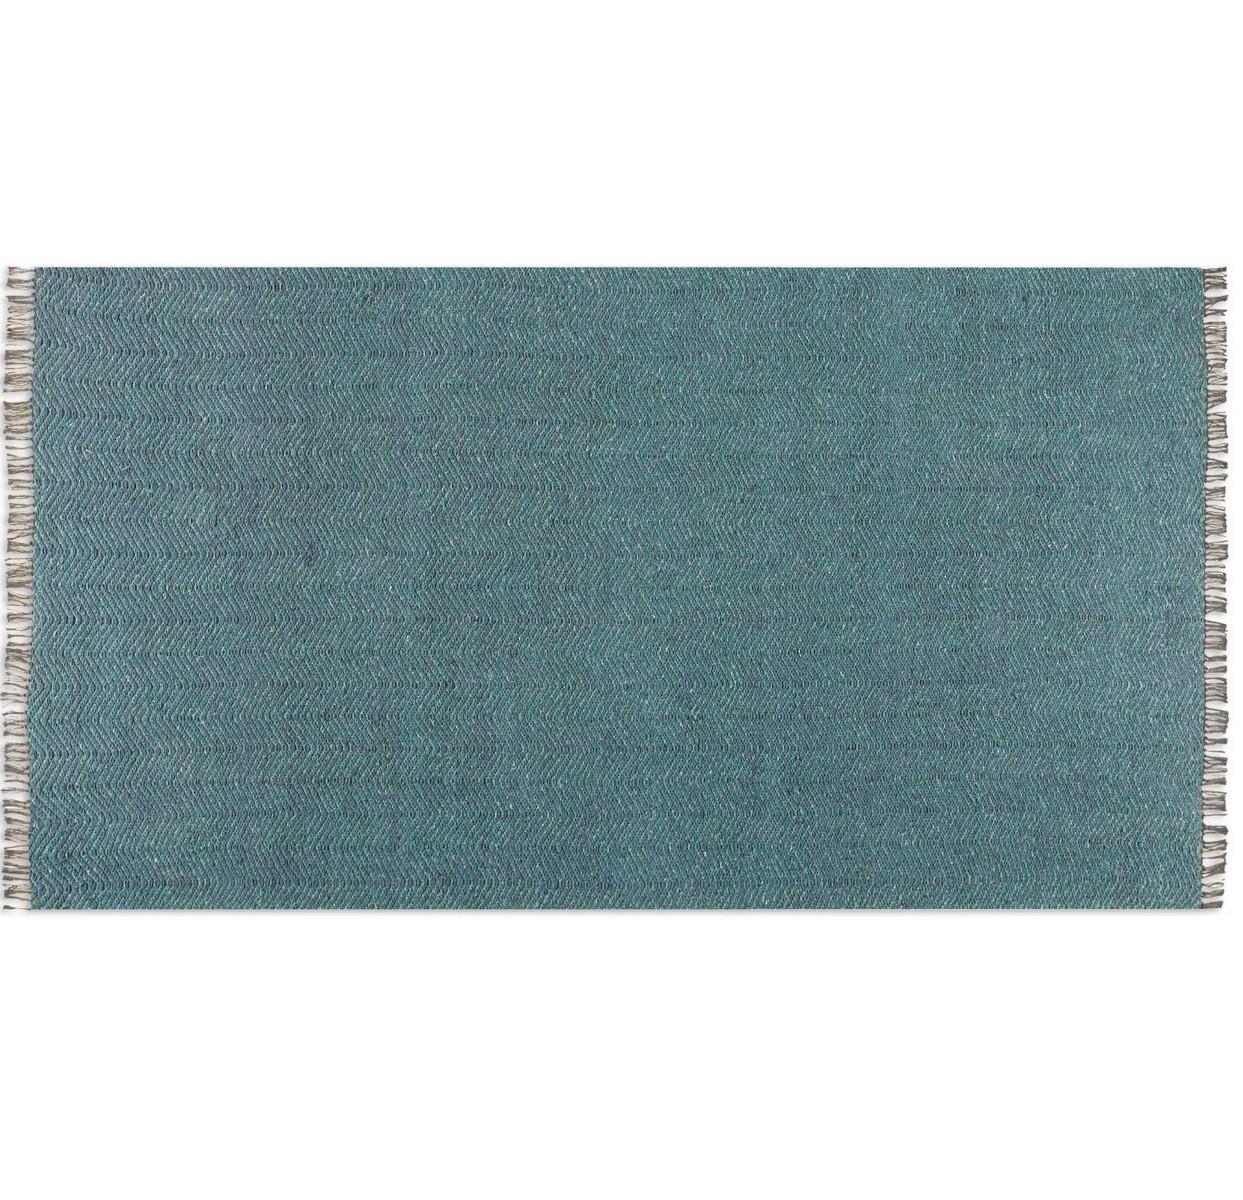 Uttermost Cascadia 5 X 8 Cotton Rug